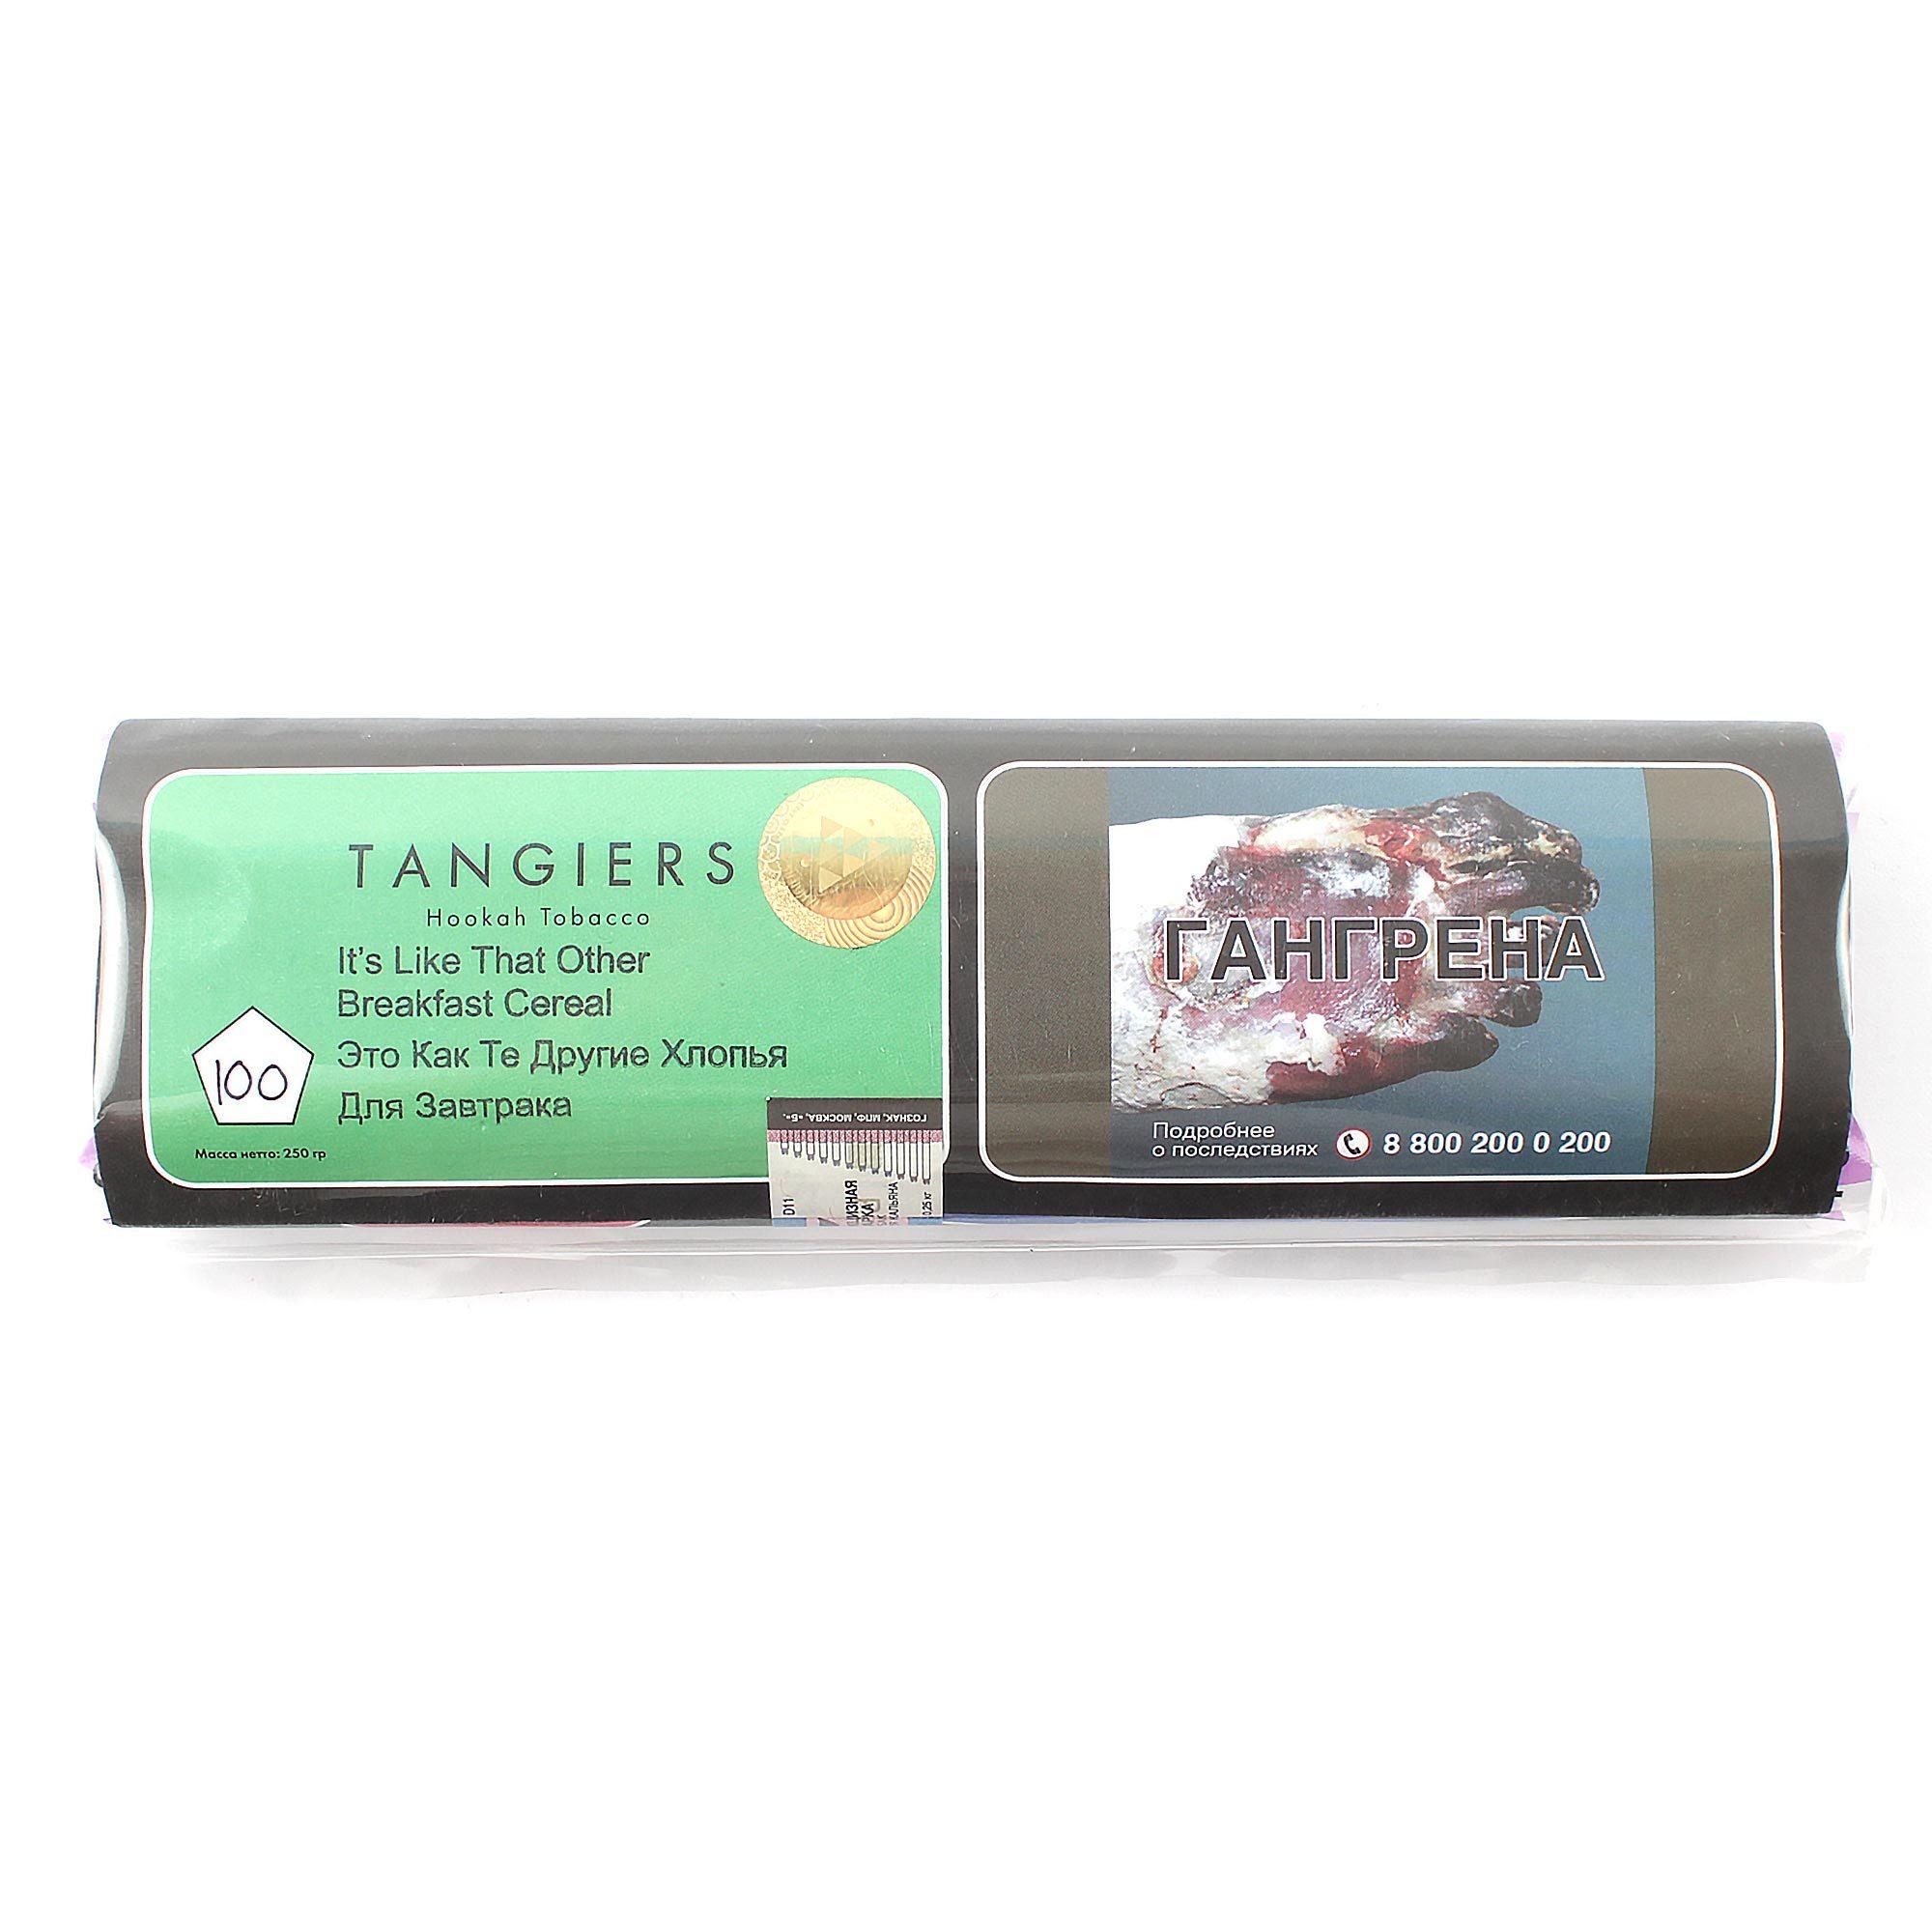 Табак для кальяна Tangiers Birquq (зеленый) 100 It's Like That Other Breakfast Cereal